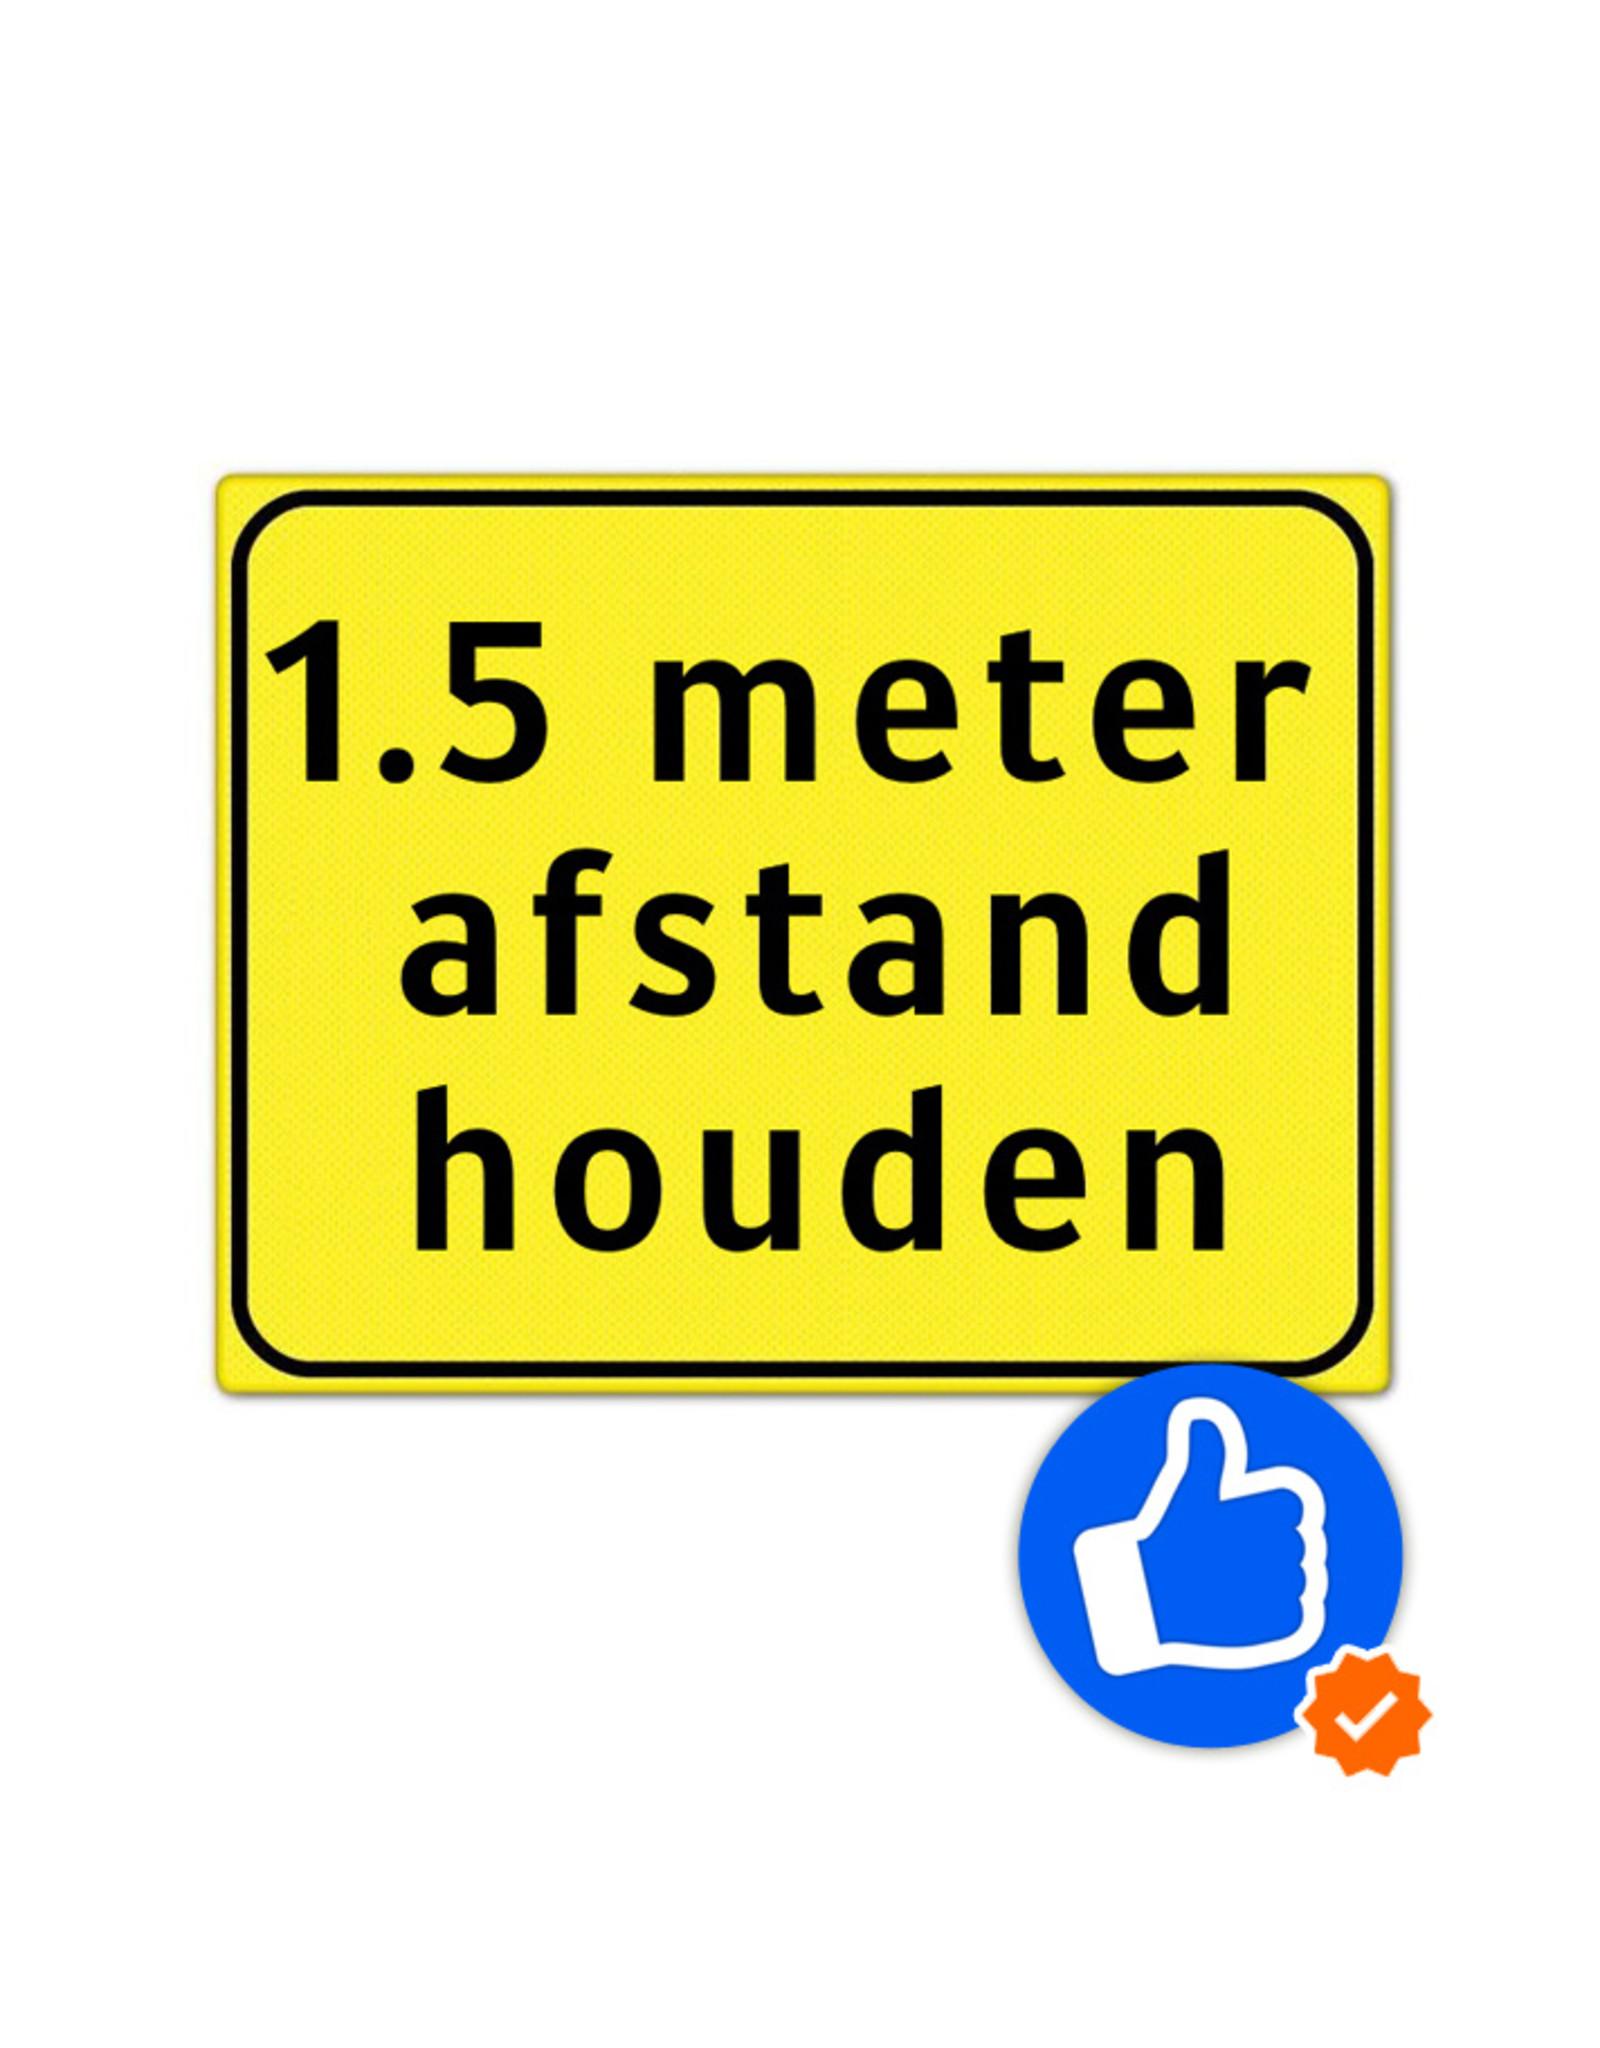 Verkeerswinkel   Bord afstand houden met 1,5 meter tekst